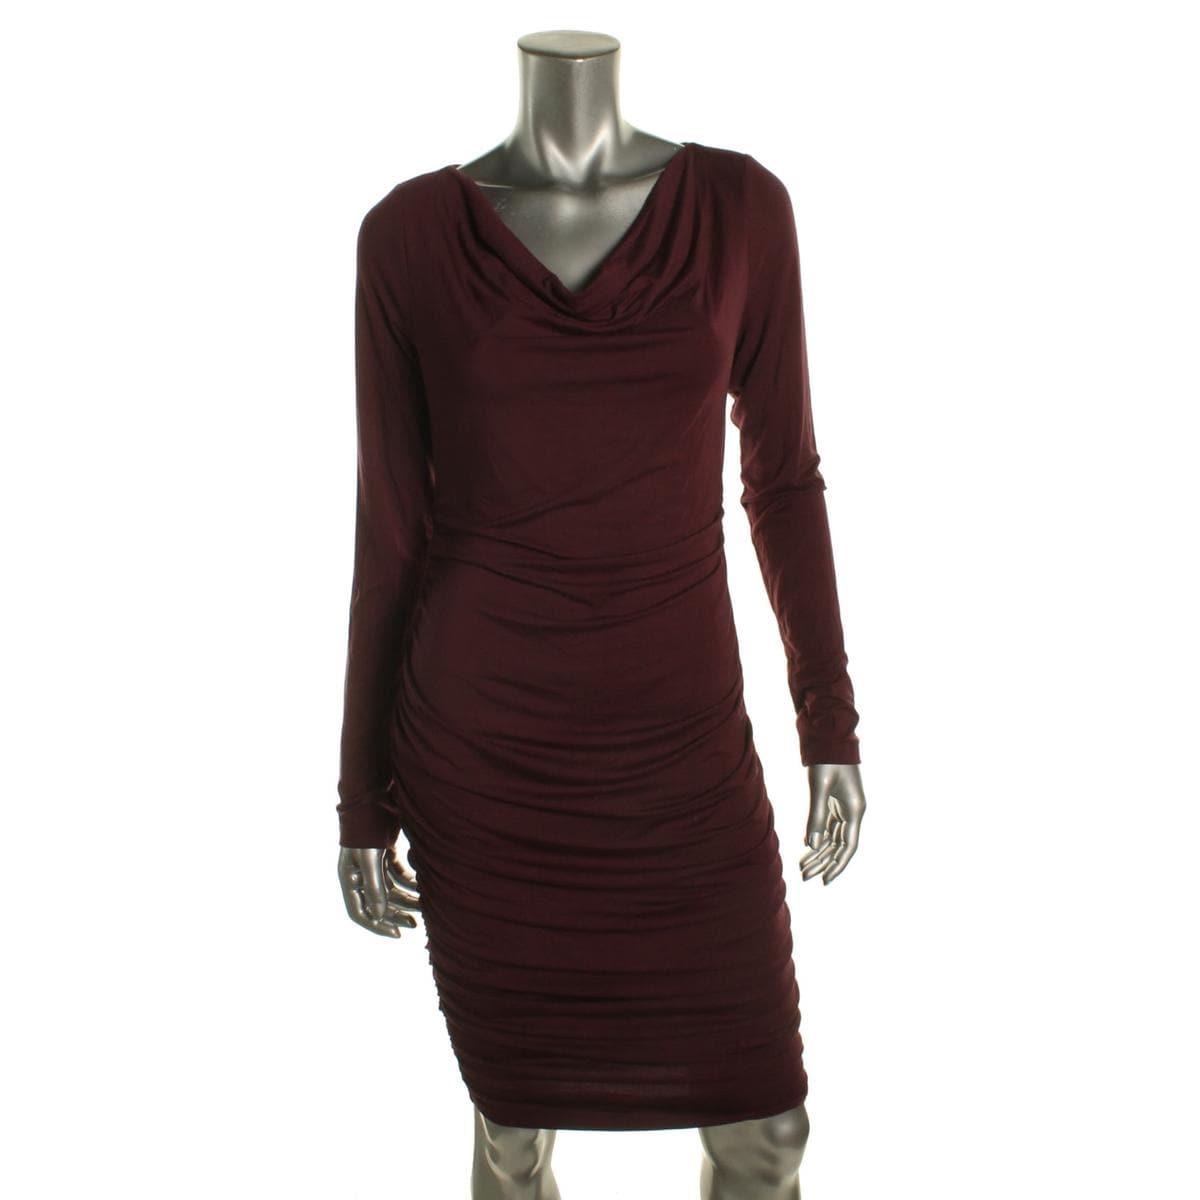 e07068c8446e6 Womens Ruched Maternity Maxi Dress – DACC